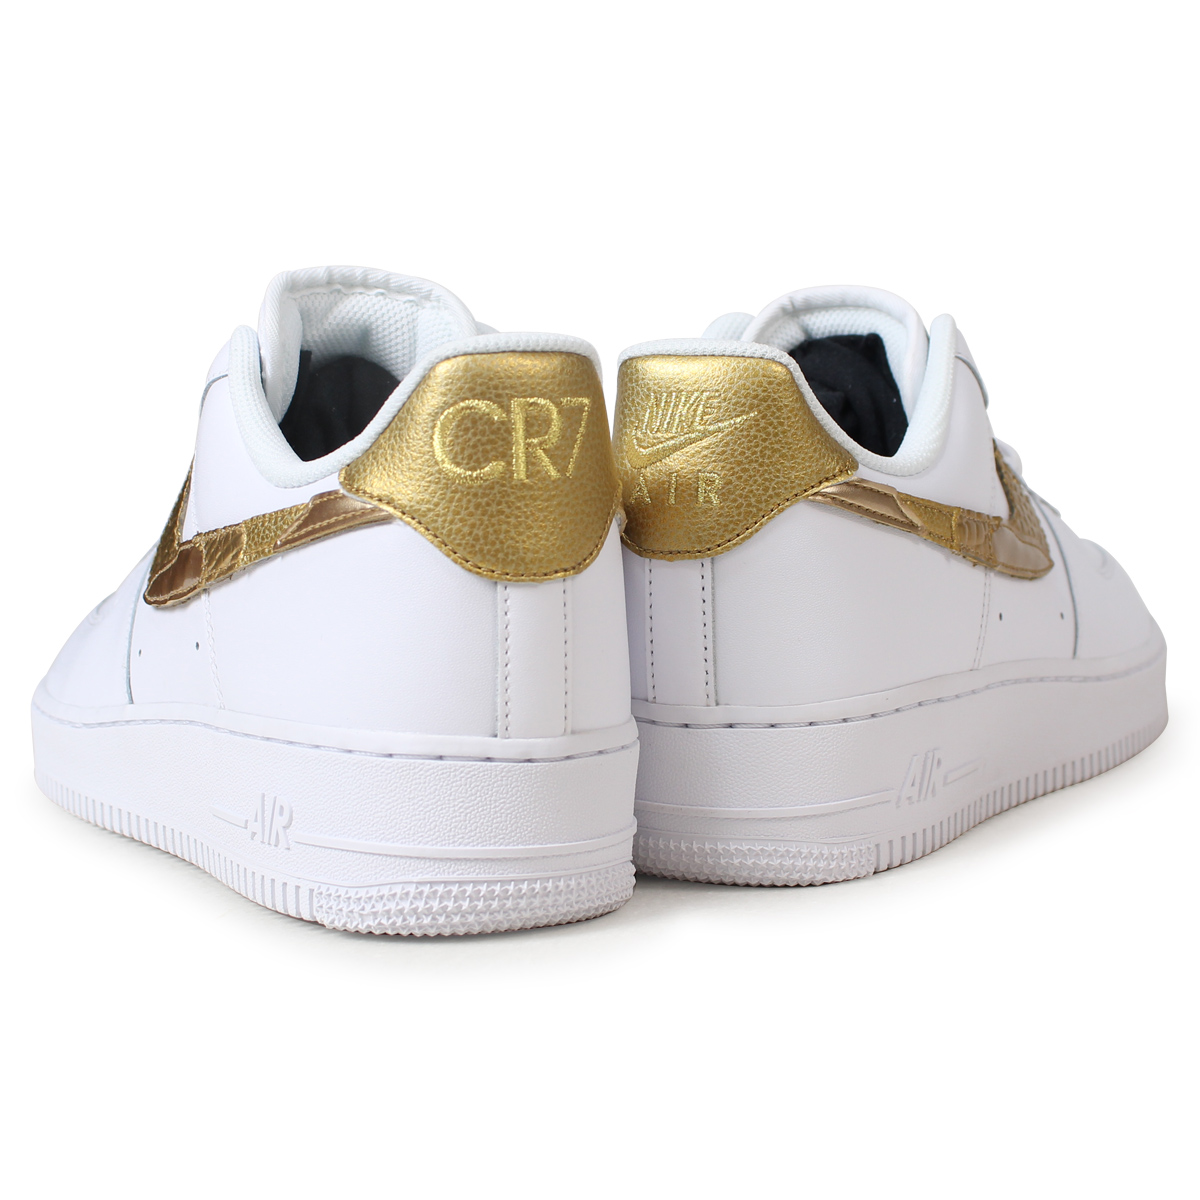 afa097b55e0e ... NIKE Nike air force 1 07 sneakers men AIR FORCE 1 CR7 GOLDEN PATCHWORK  AQ0666- ...